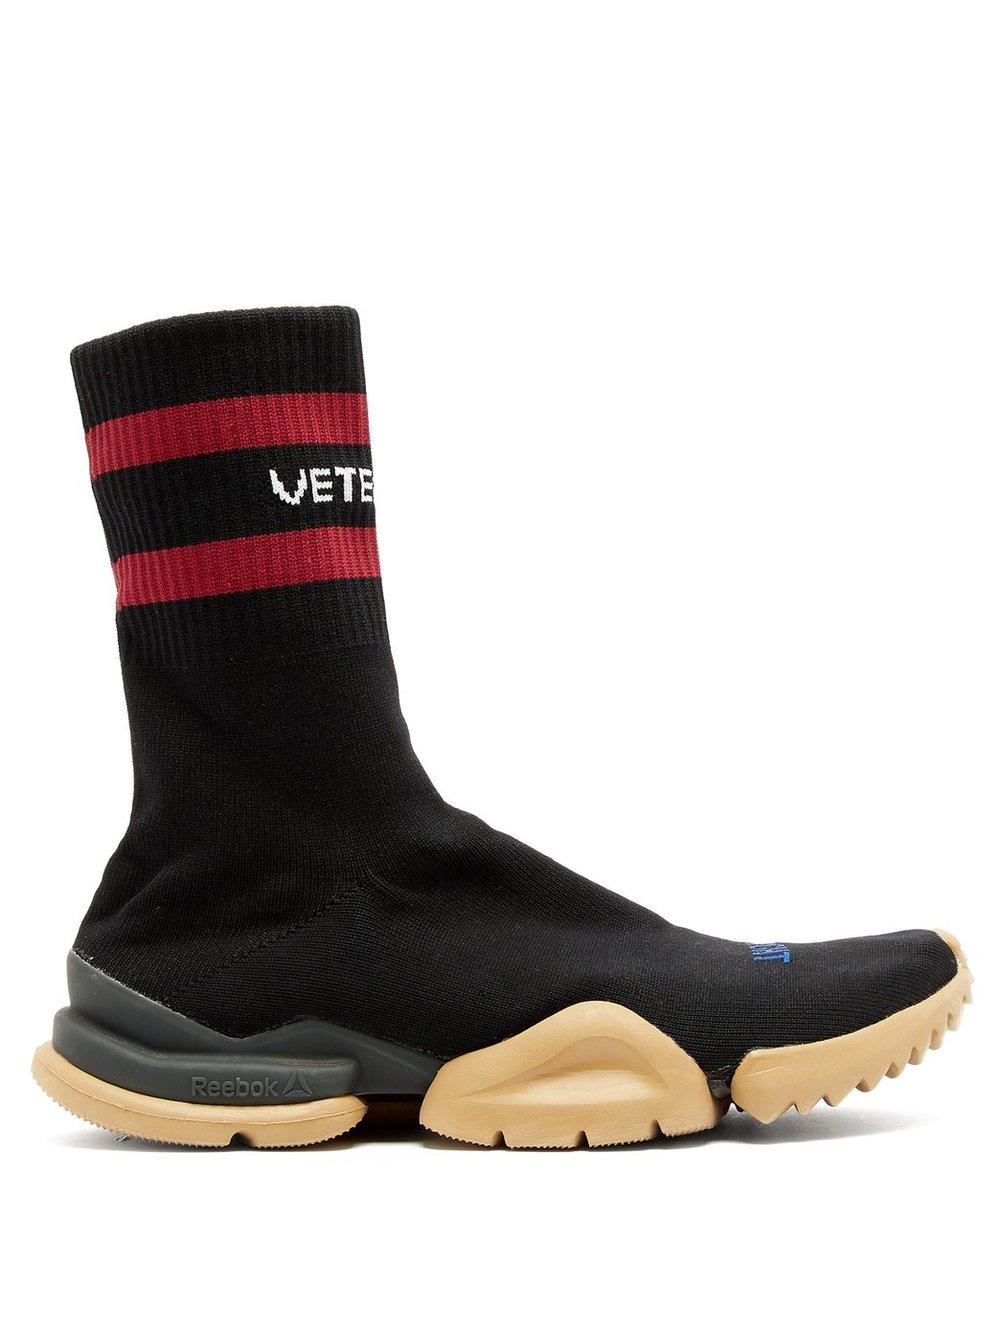 Vetements x Reebok sneakers - £655 - That high top sock sneaker trend is going nowhere fast